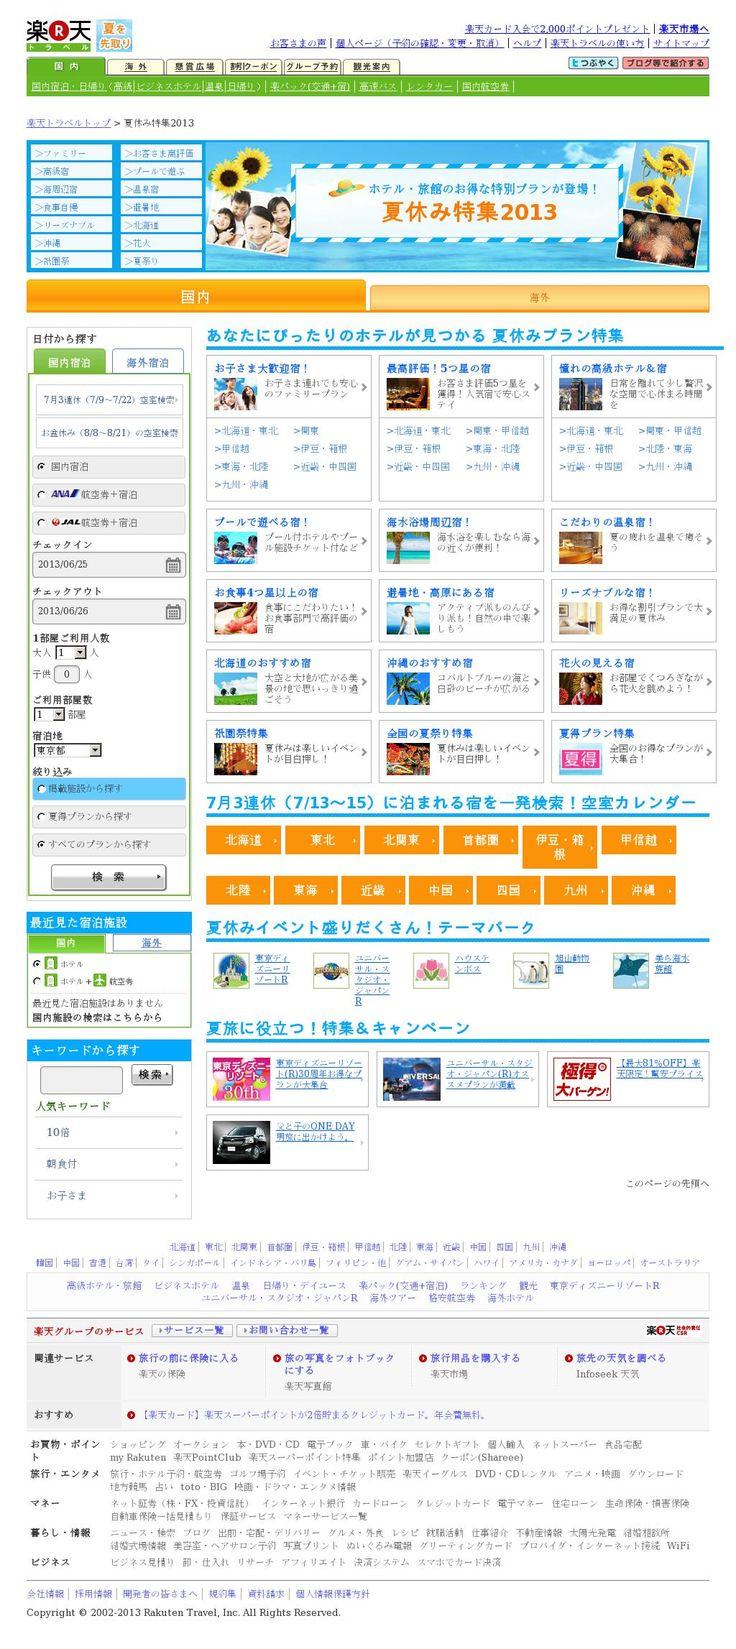 【D】【大型特集】夏休み特集2013<2013/05/13>